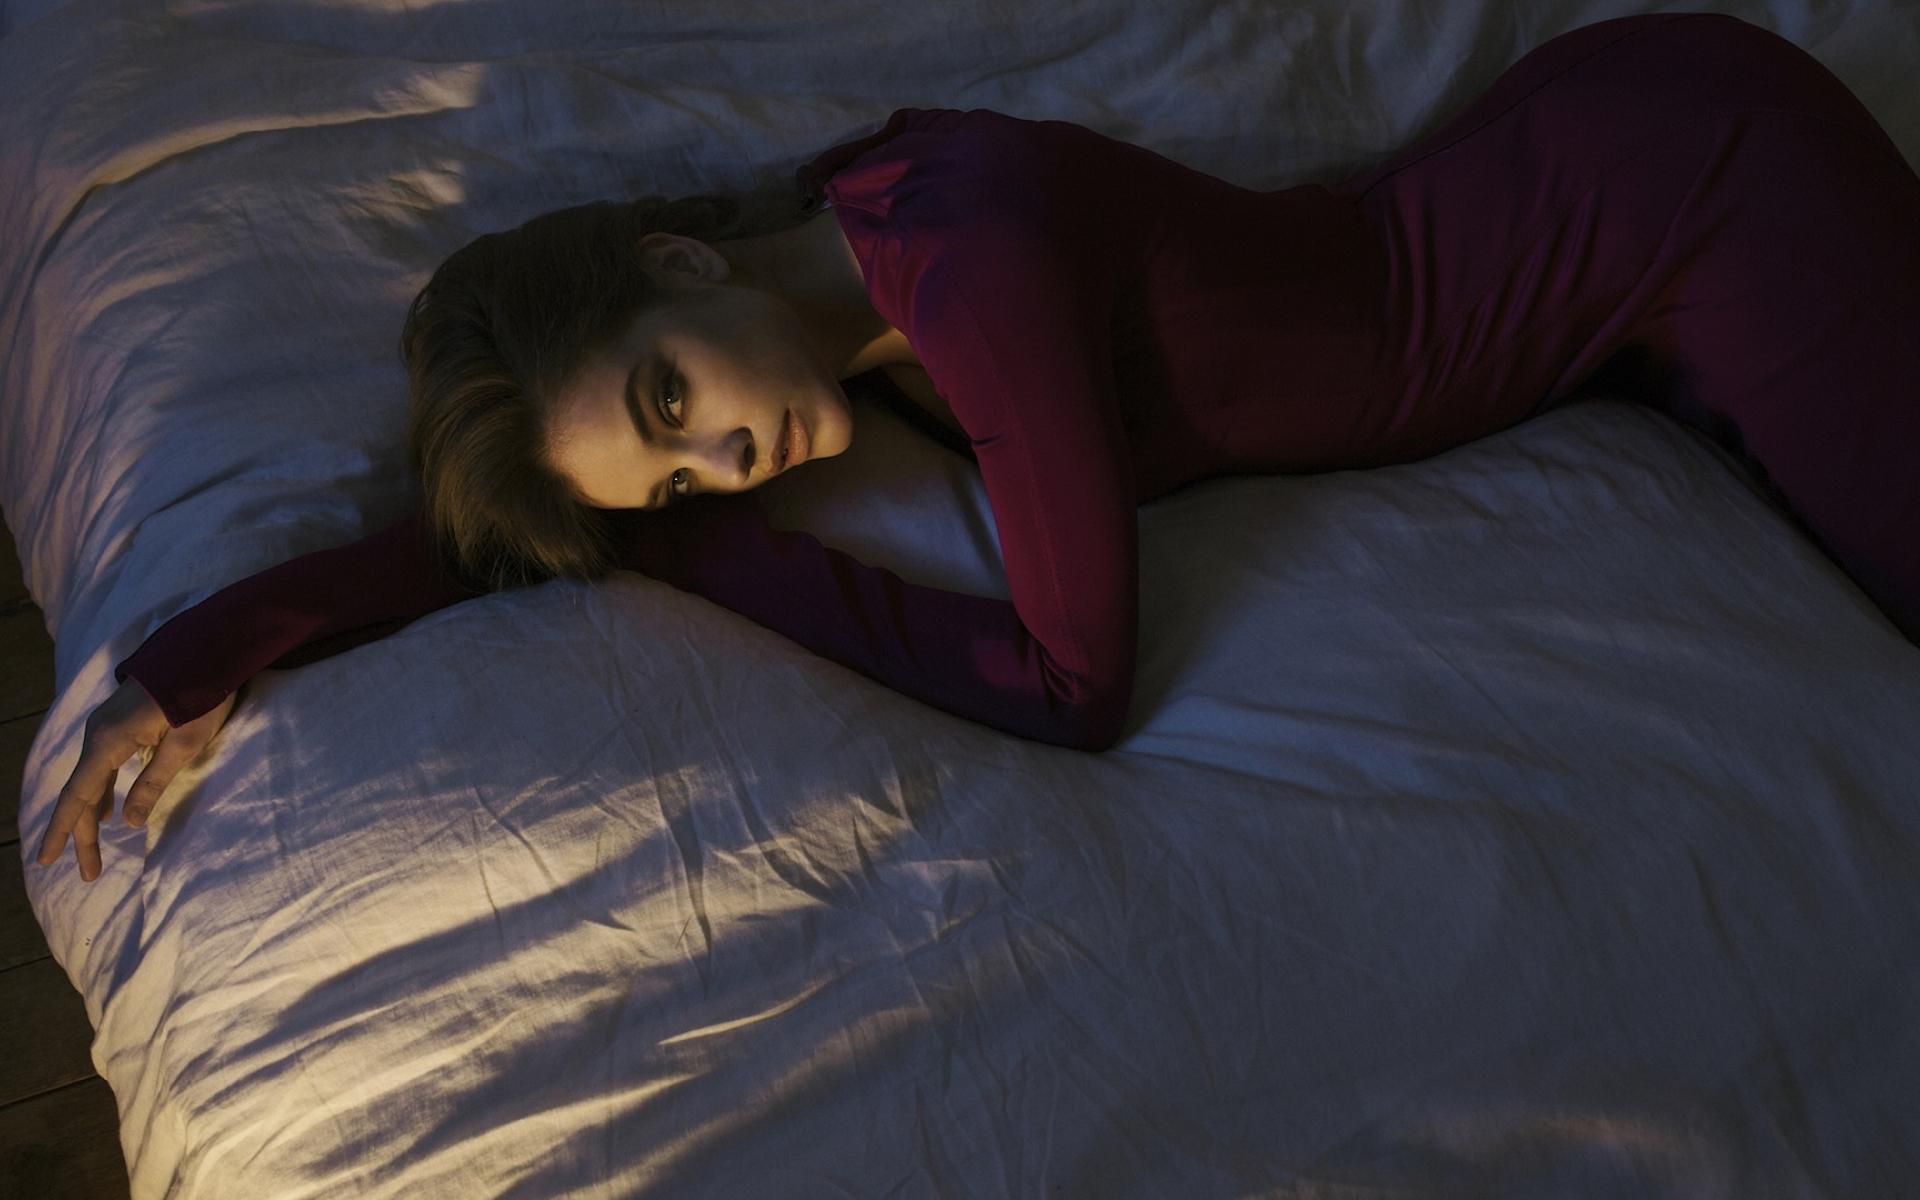 Barbara Palvin Hot Brunette Model In Bed Full Hd Wallpaper